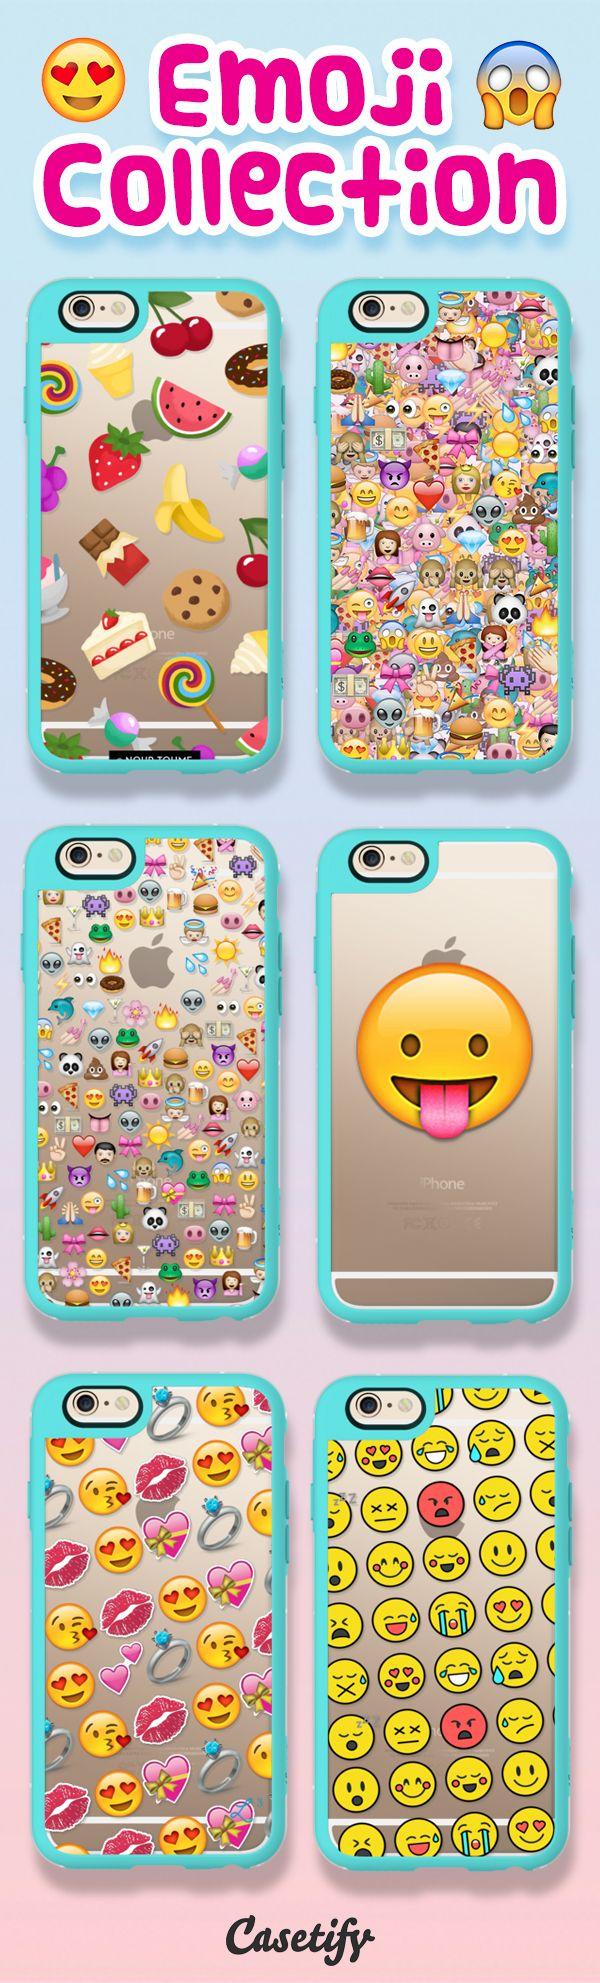 Talk emoji to me! Shop these emoji cases on our website now! https://www.casetify.com/search?keyword=emoji | @casetify